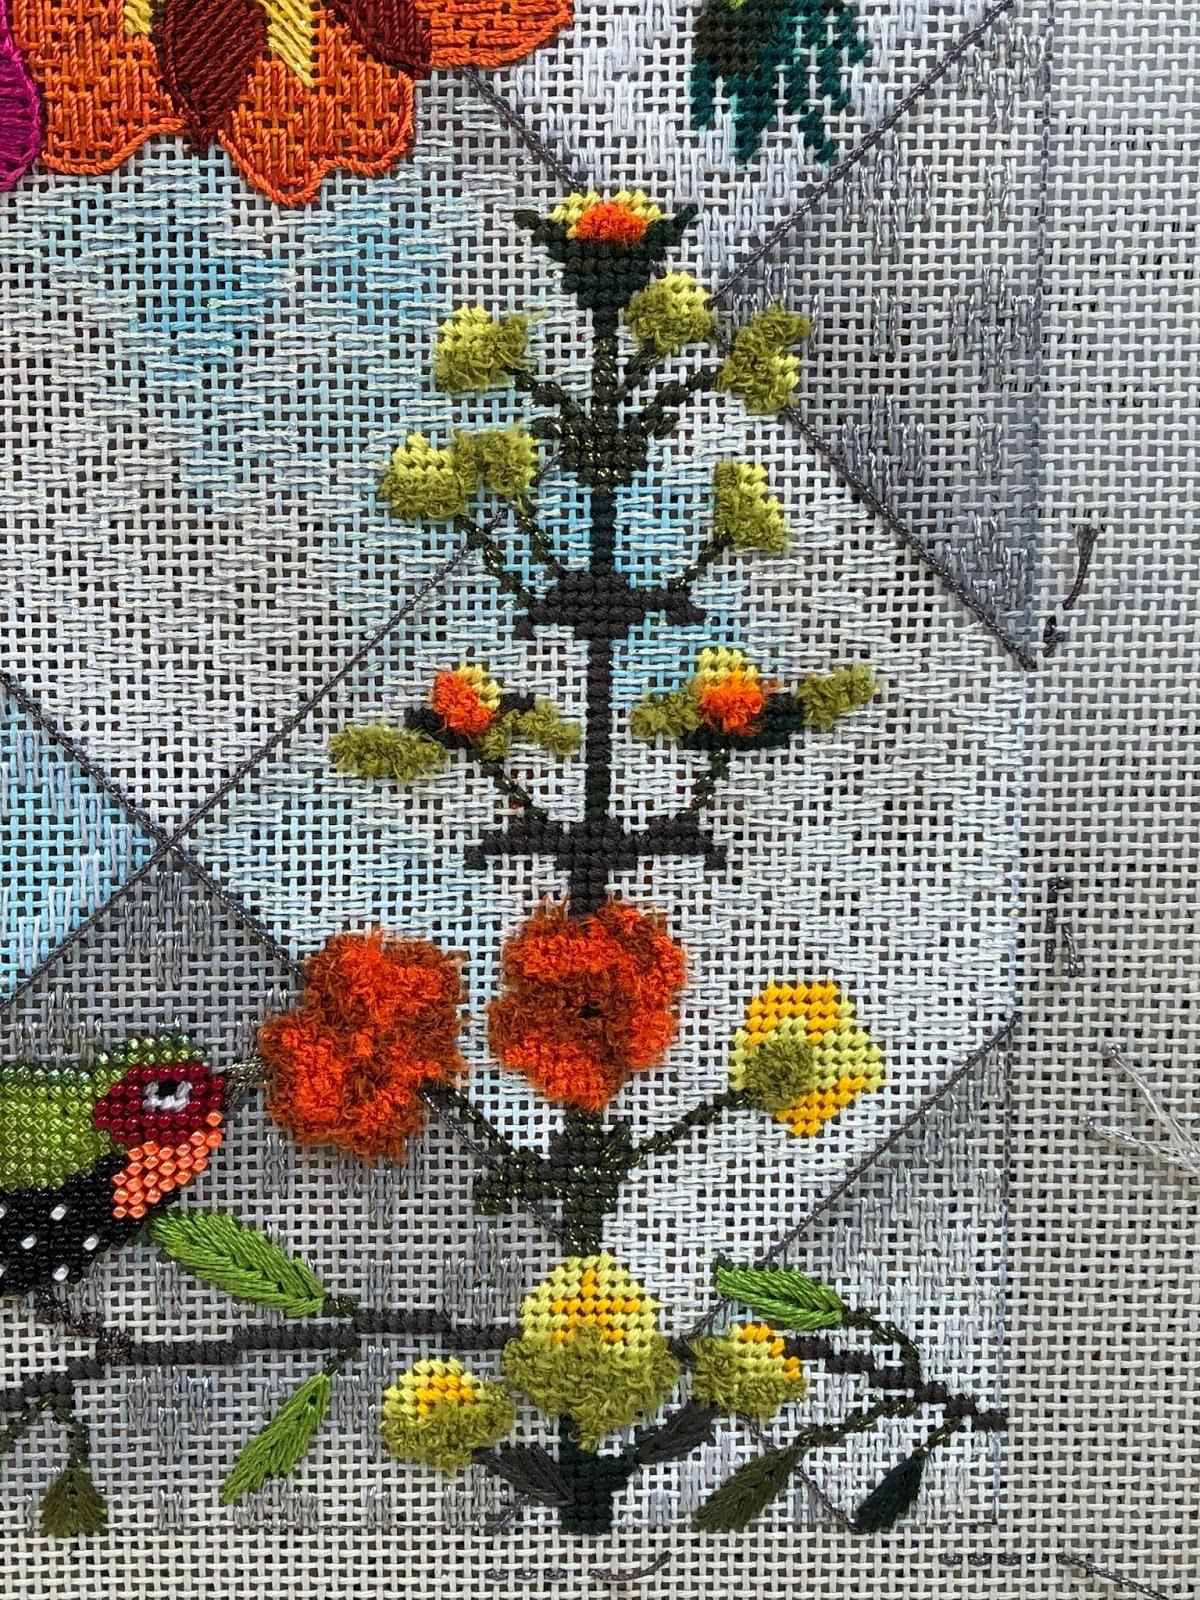 Split The Needles More Orange And Yellow Flowers